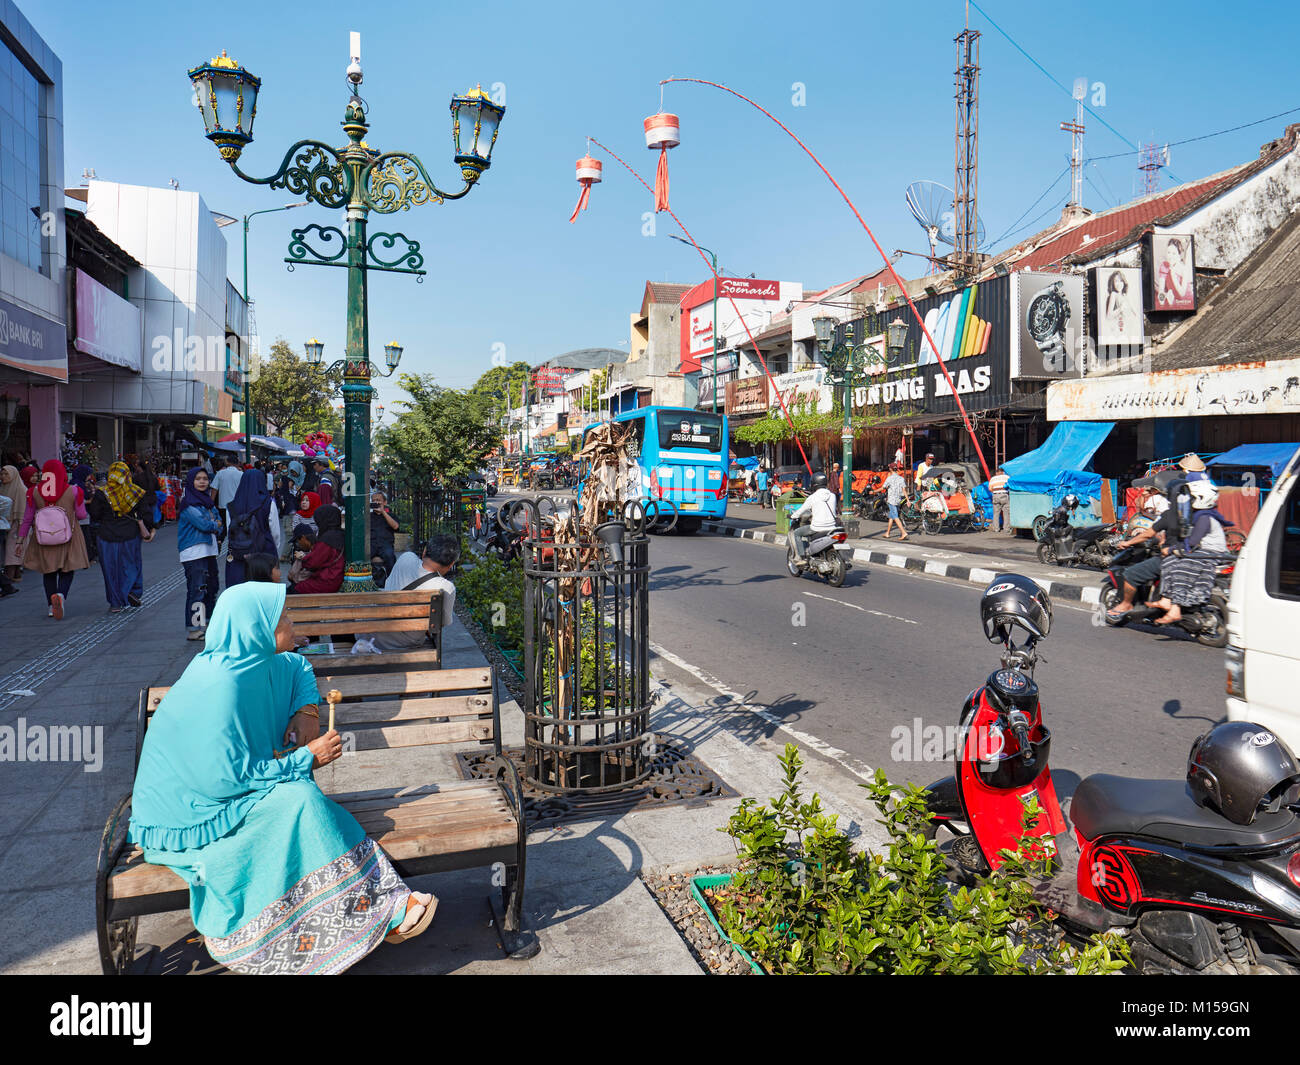 muslim woman sitting on a bench on malioboro street yogyakarta java M159GN